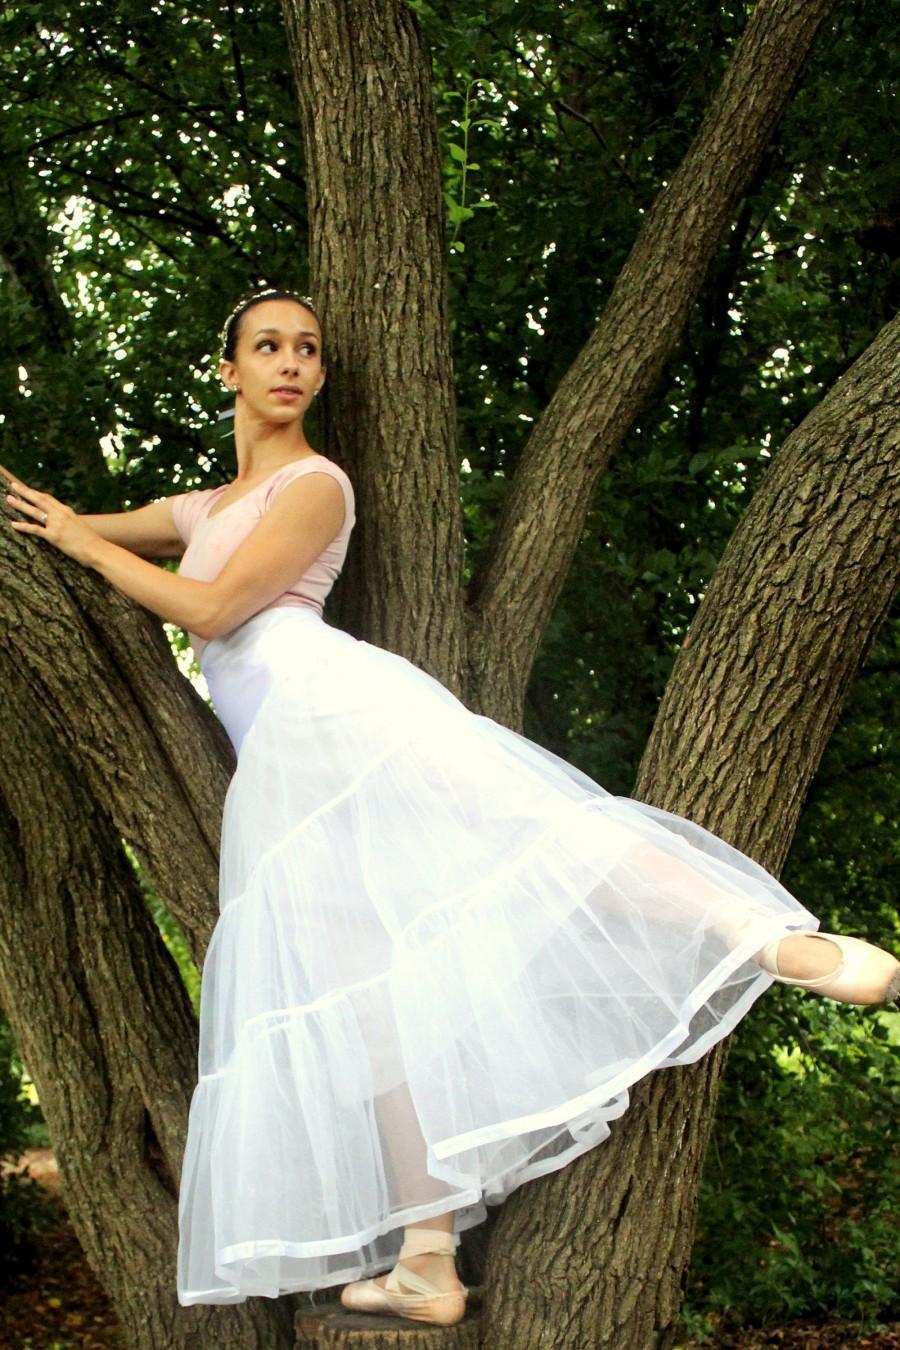 Mariage - Petticoat Slip - A-line Petticoat - Bridal Petticoat - Bridal Slip - Petticoat Slip - A-Line Slip - White Petticoat - Long Petticoat Slip